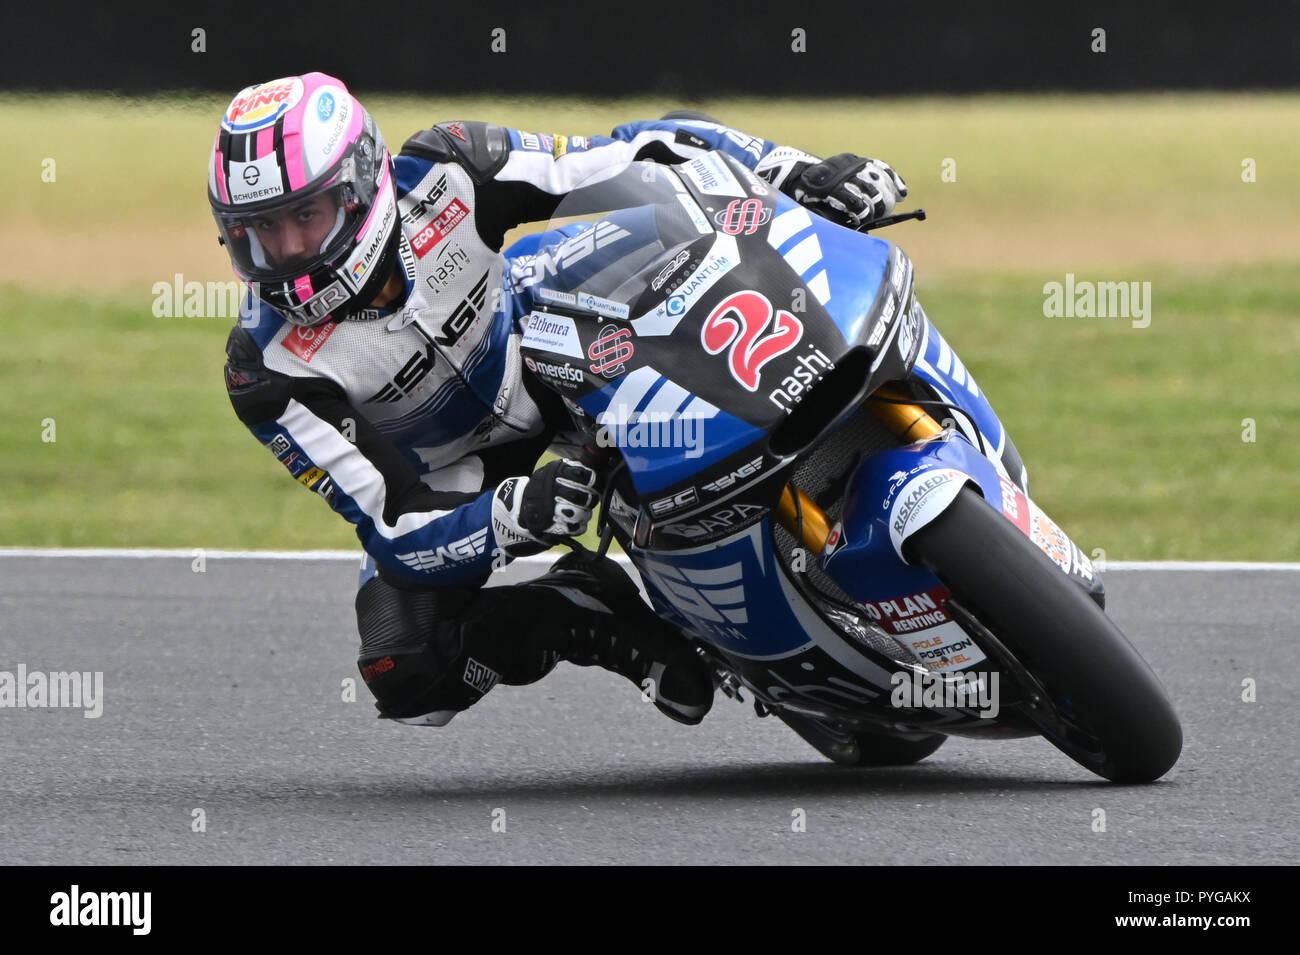 October 27, 2018: Jesko RAFFIN (SWI) riding the KALEX from the SAG Team during the Moto2 practice session three at the 2018 MotoGP of Australia at Phillip Island Grand Prix Circuit, Victoria, Australia. Sydney Low/Cal Sport Media Stock Photo